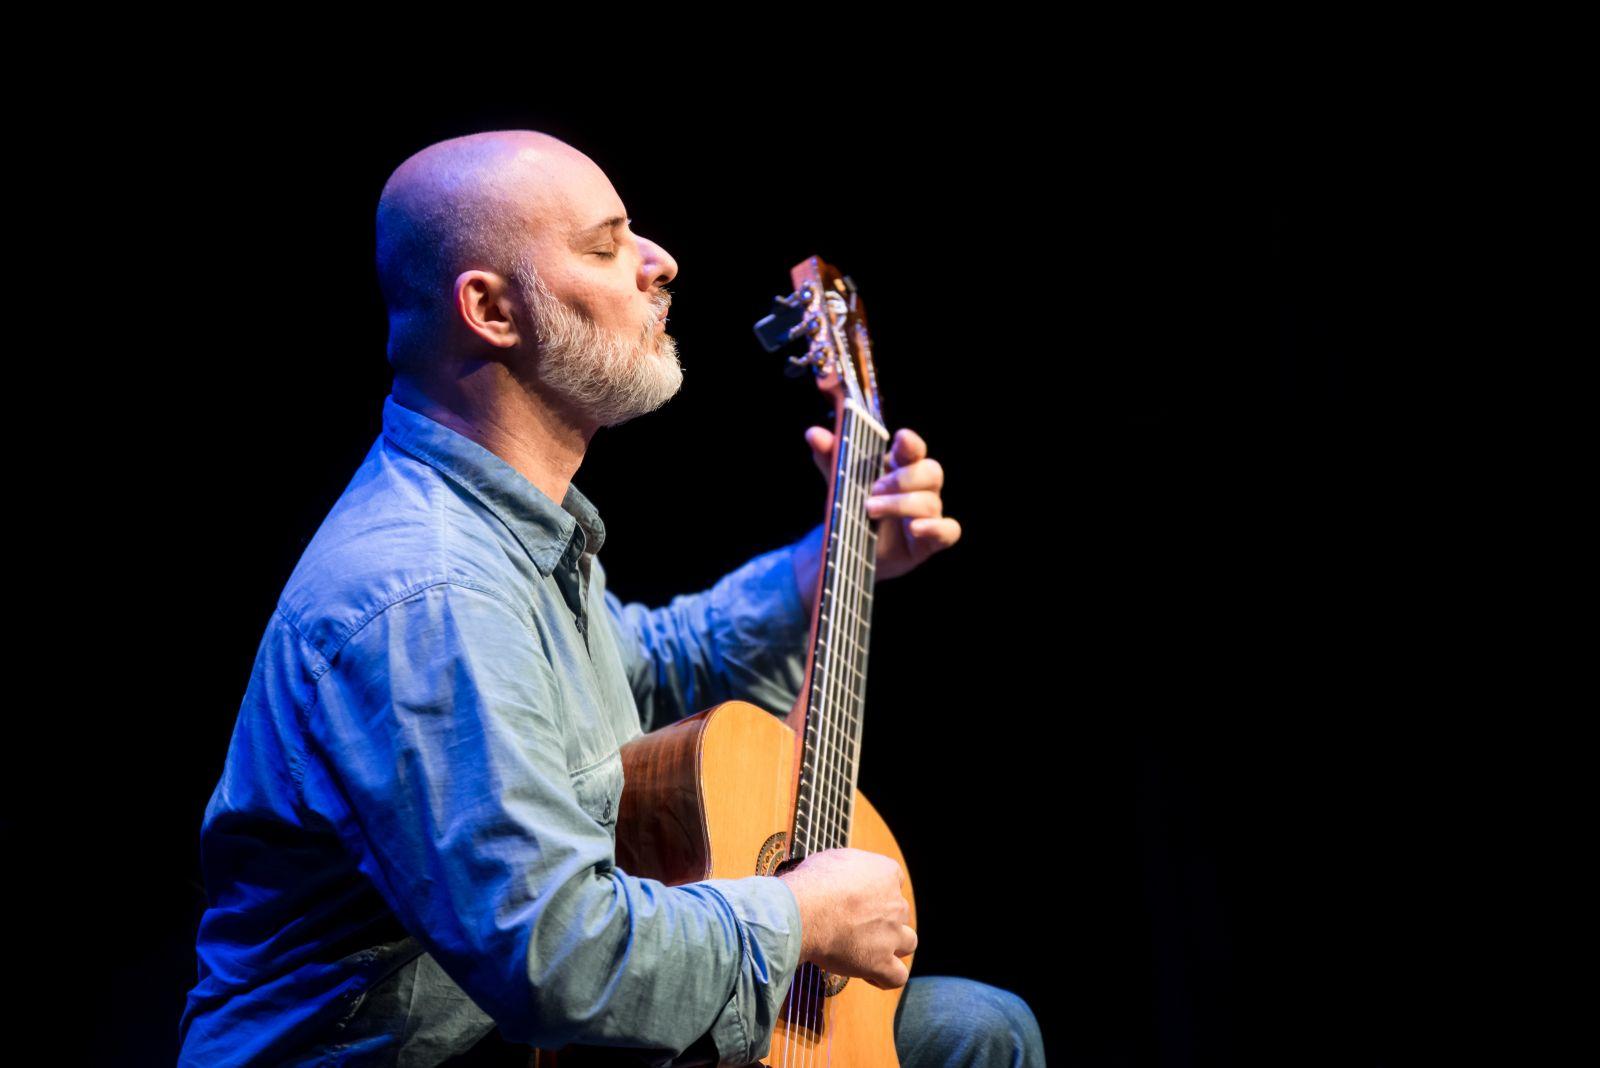 As cordas brasileiras no 39º Festival Internacional de Música de Londrina - André Siqueira. Créditos: Íris Zanetti